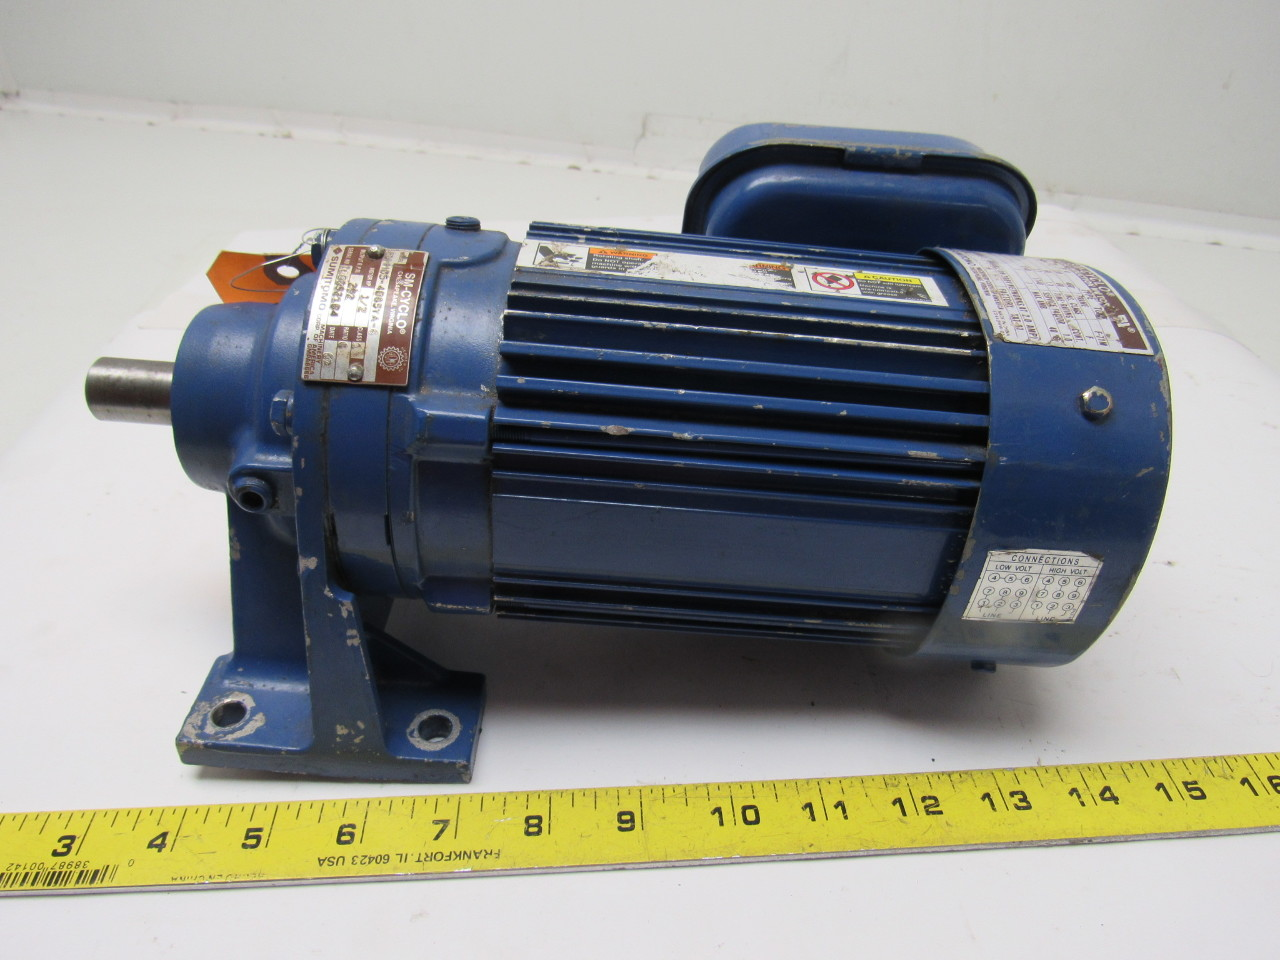 Sumitomo SM-Cyclo CNHM05-4085YA-6 1/2HP Gear Motor 6:1 Ratio 208-230/460V 3Ph